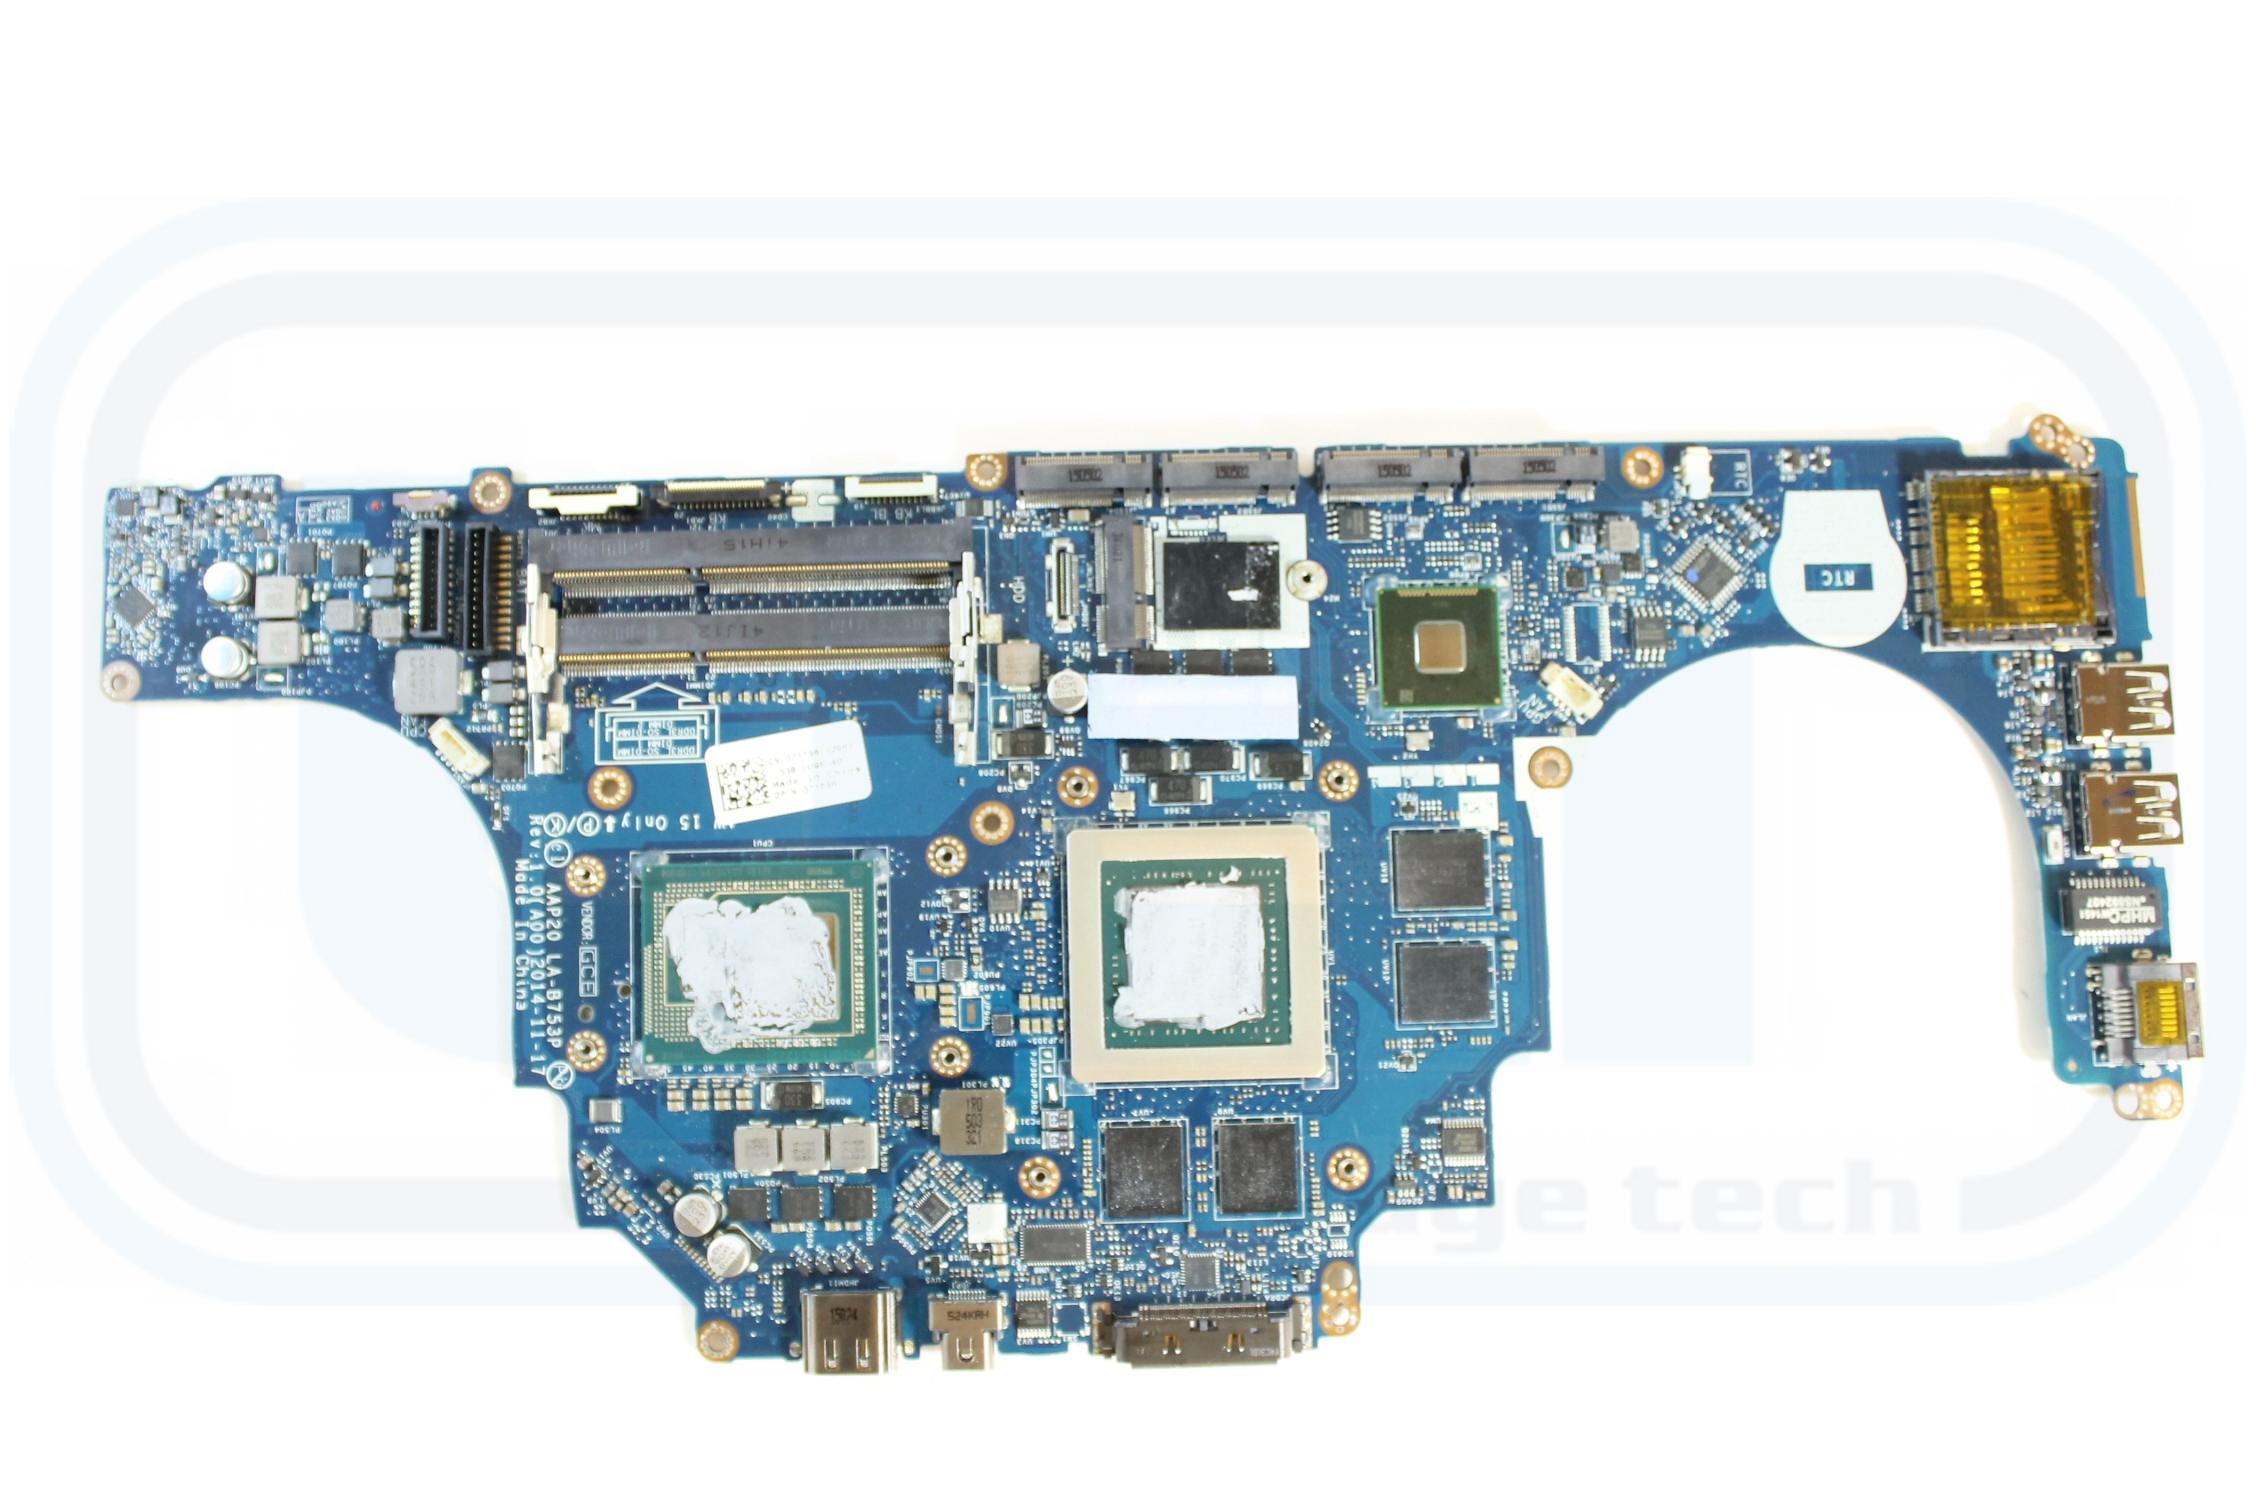 Dell Motherboard nVidia 4 GB i7 4980HQ 2 8 GHz 71T46 Alienware 17 R2